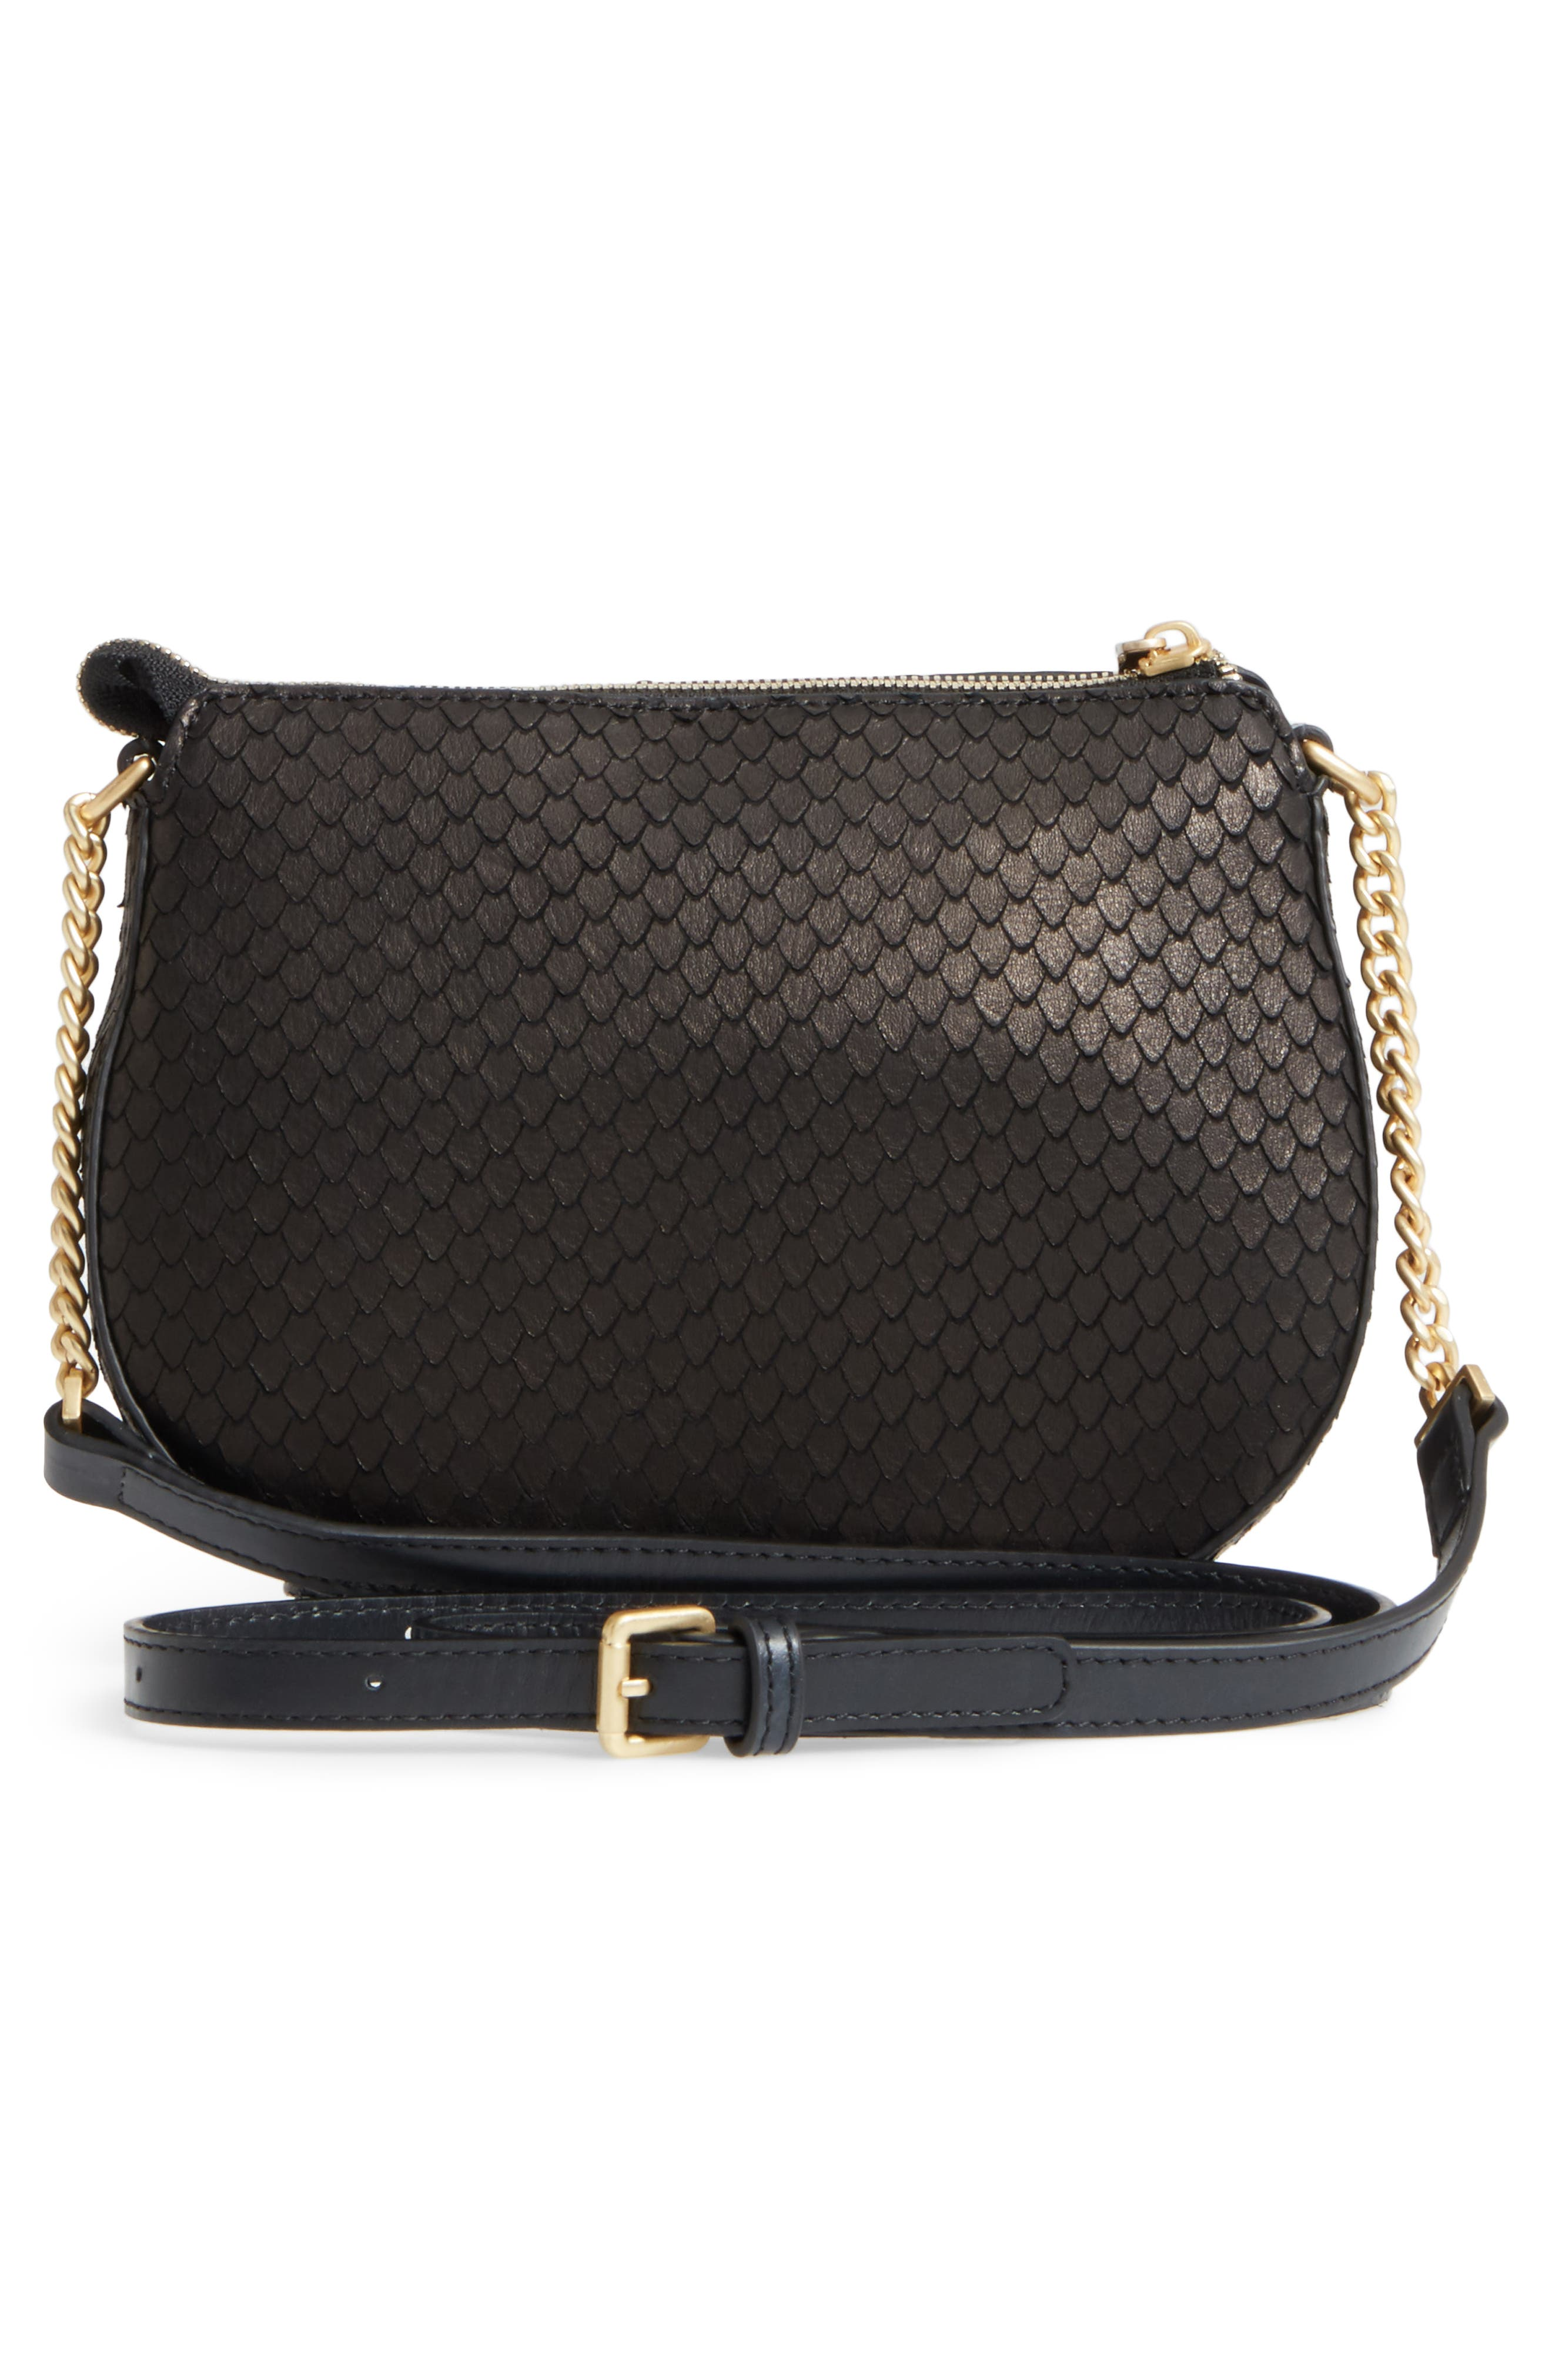 Céline Dion Octave Leather Crossbody Bag,                             Alternate thumbnail 3, color,                             Black Snake